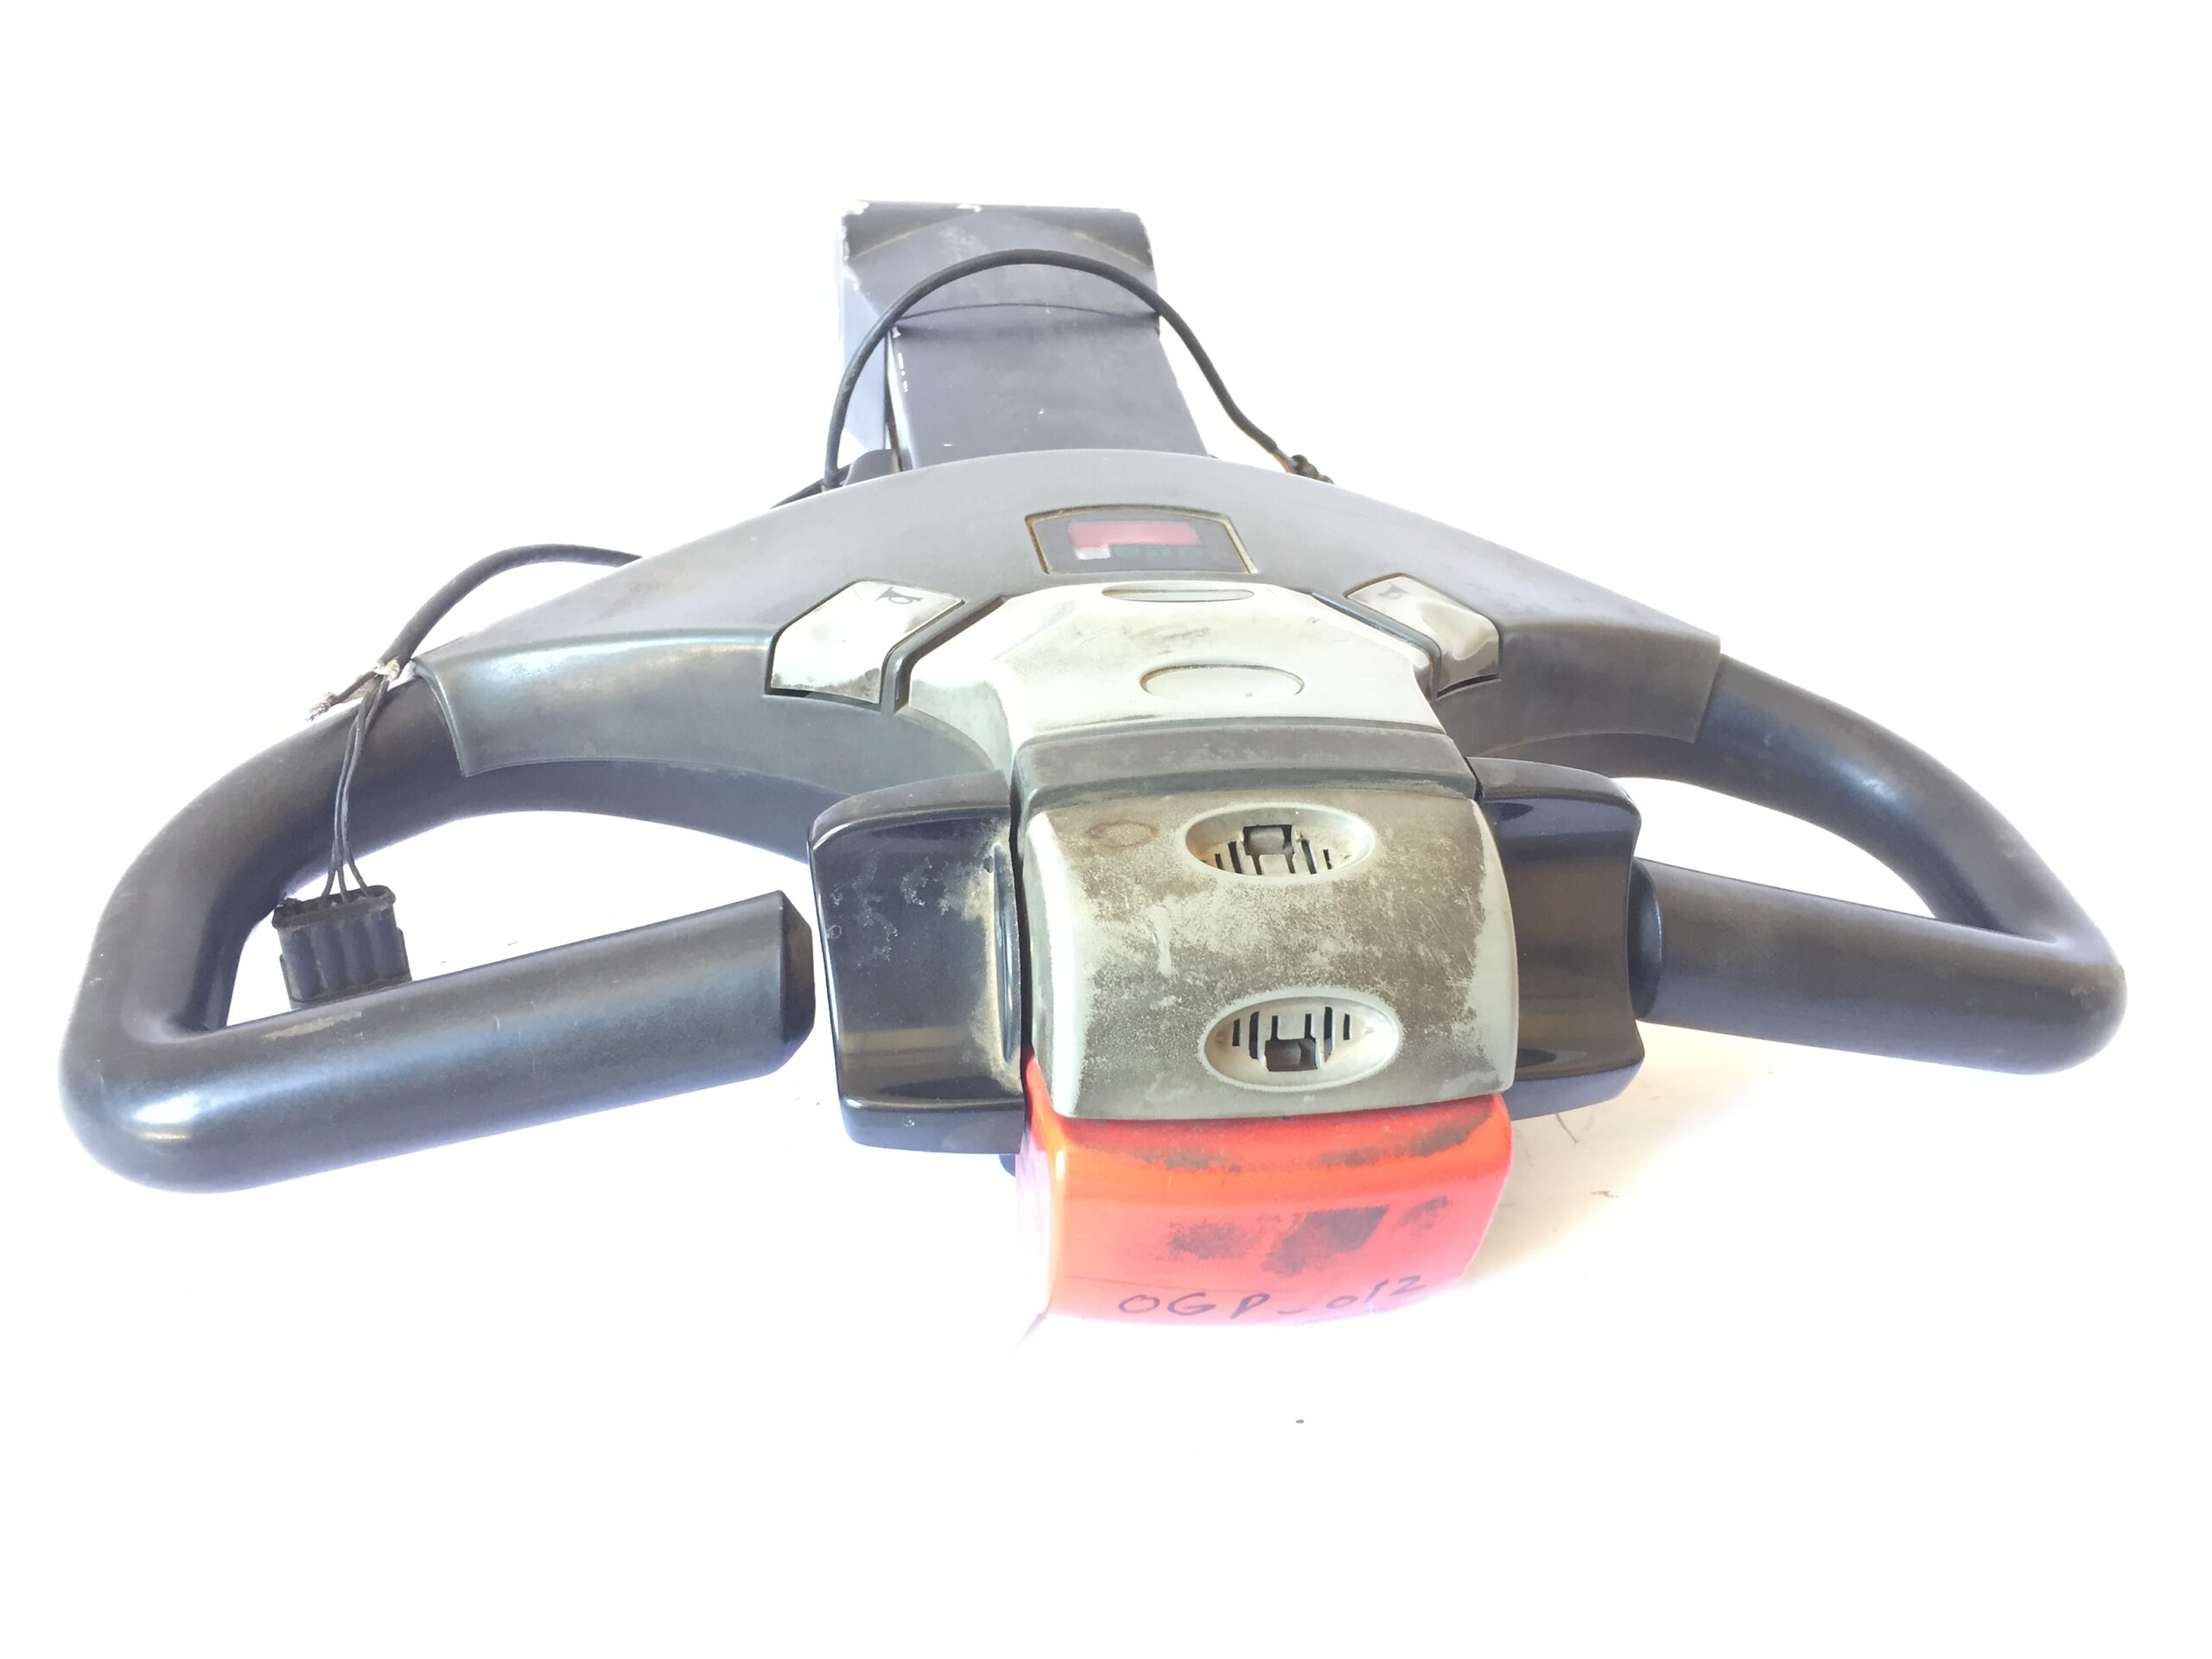   Steering Arm/ Wheel/ Lever   Fazl-e-Rasheed and Company August 2021